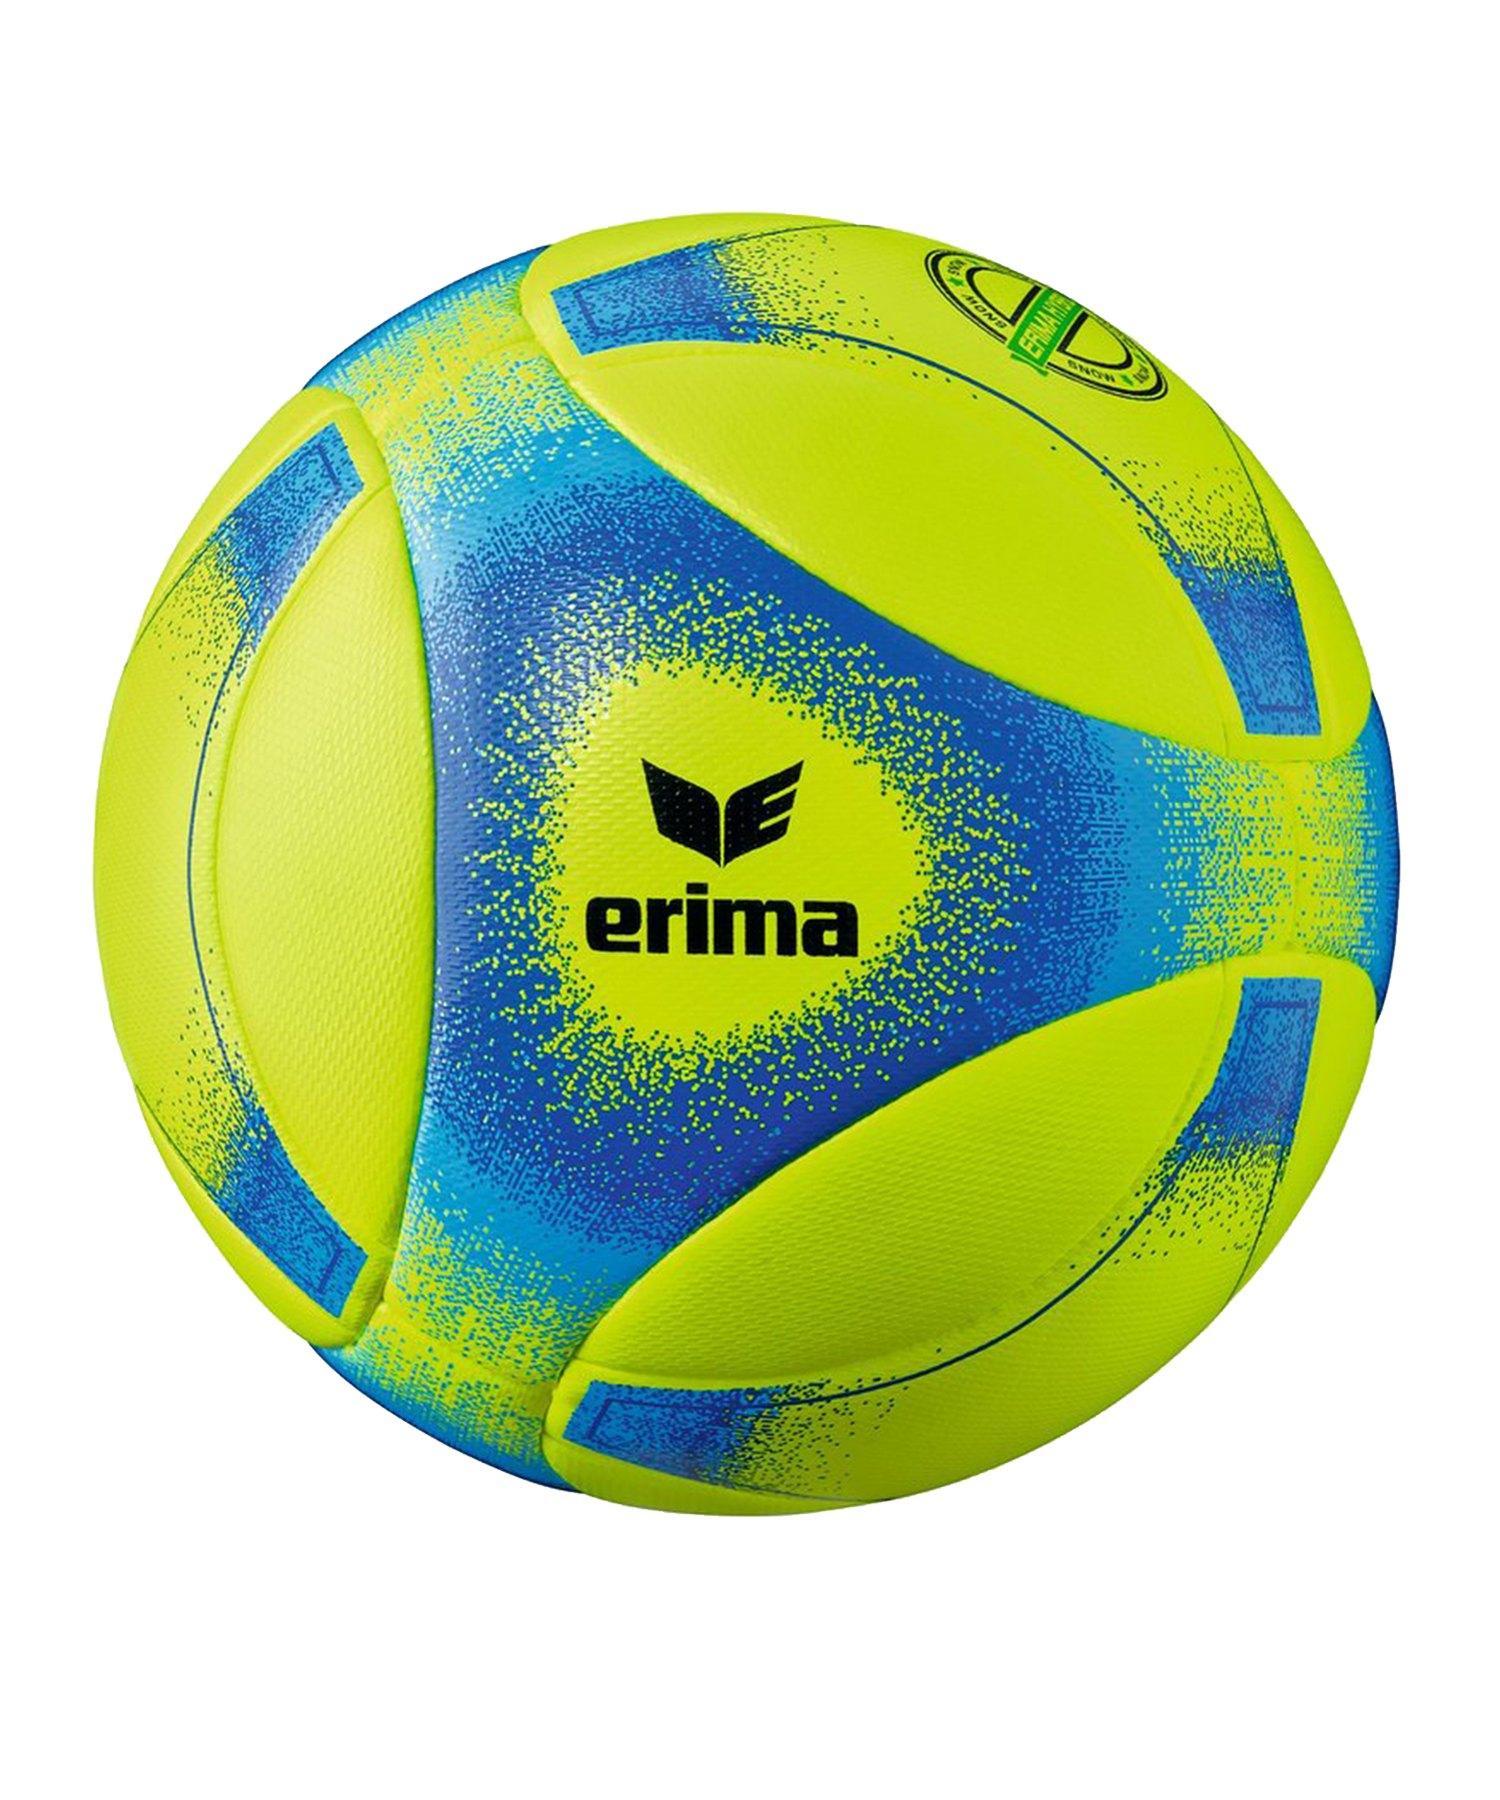 Erima ERIMA Hybrid Match Snow Gelb - Gelb